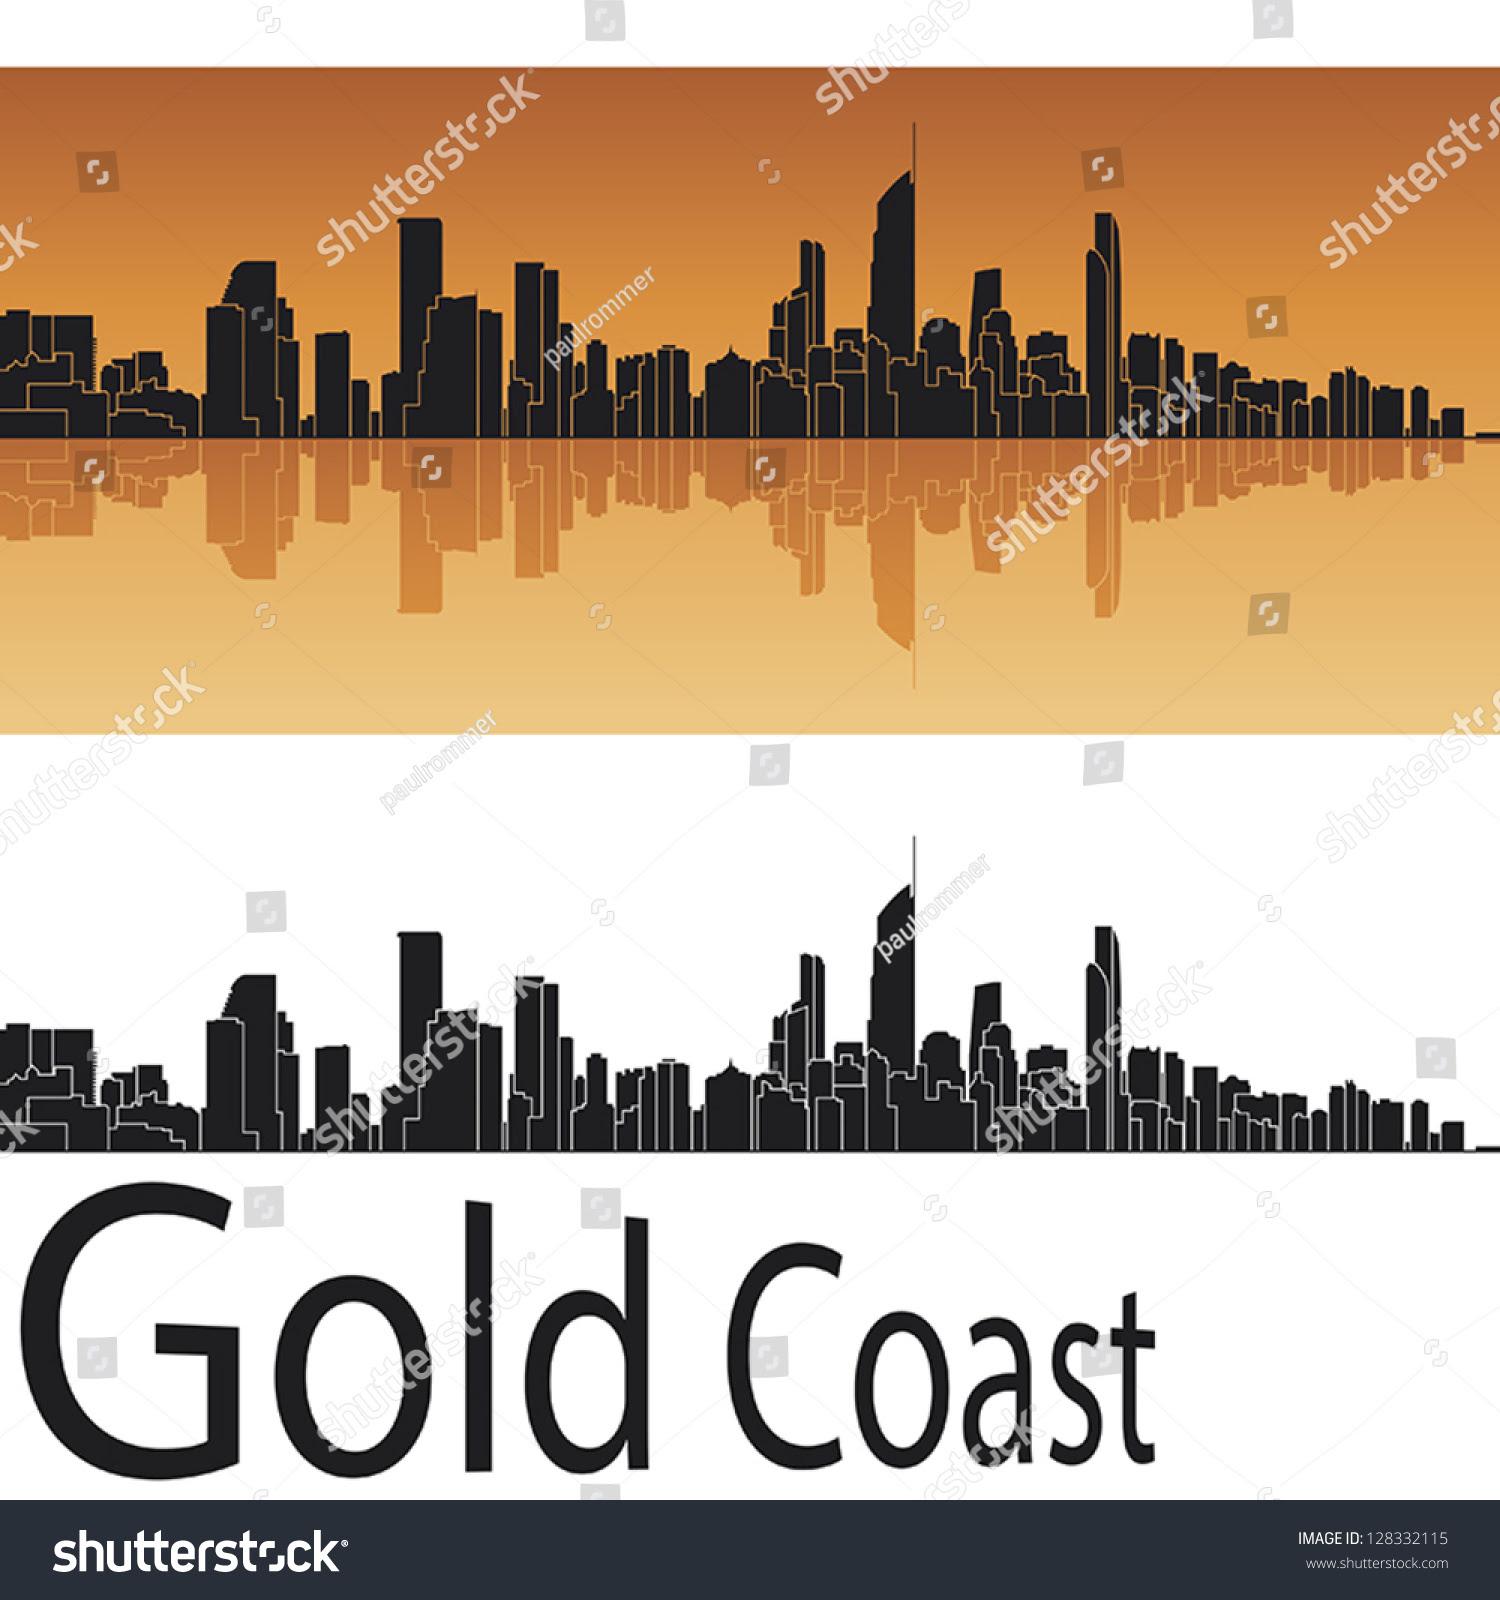 Gold Coast Skyline Orange Background Editable Stock Vector ...